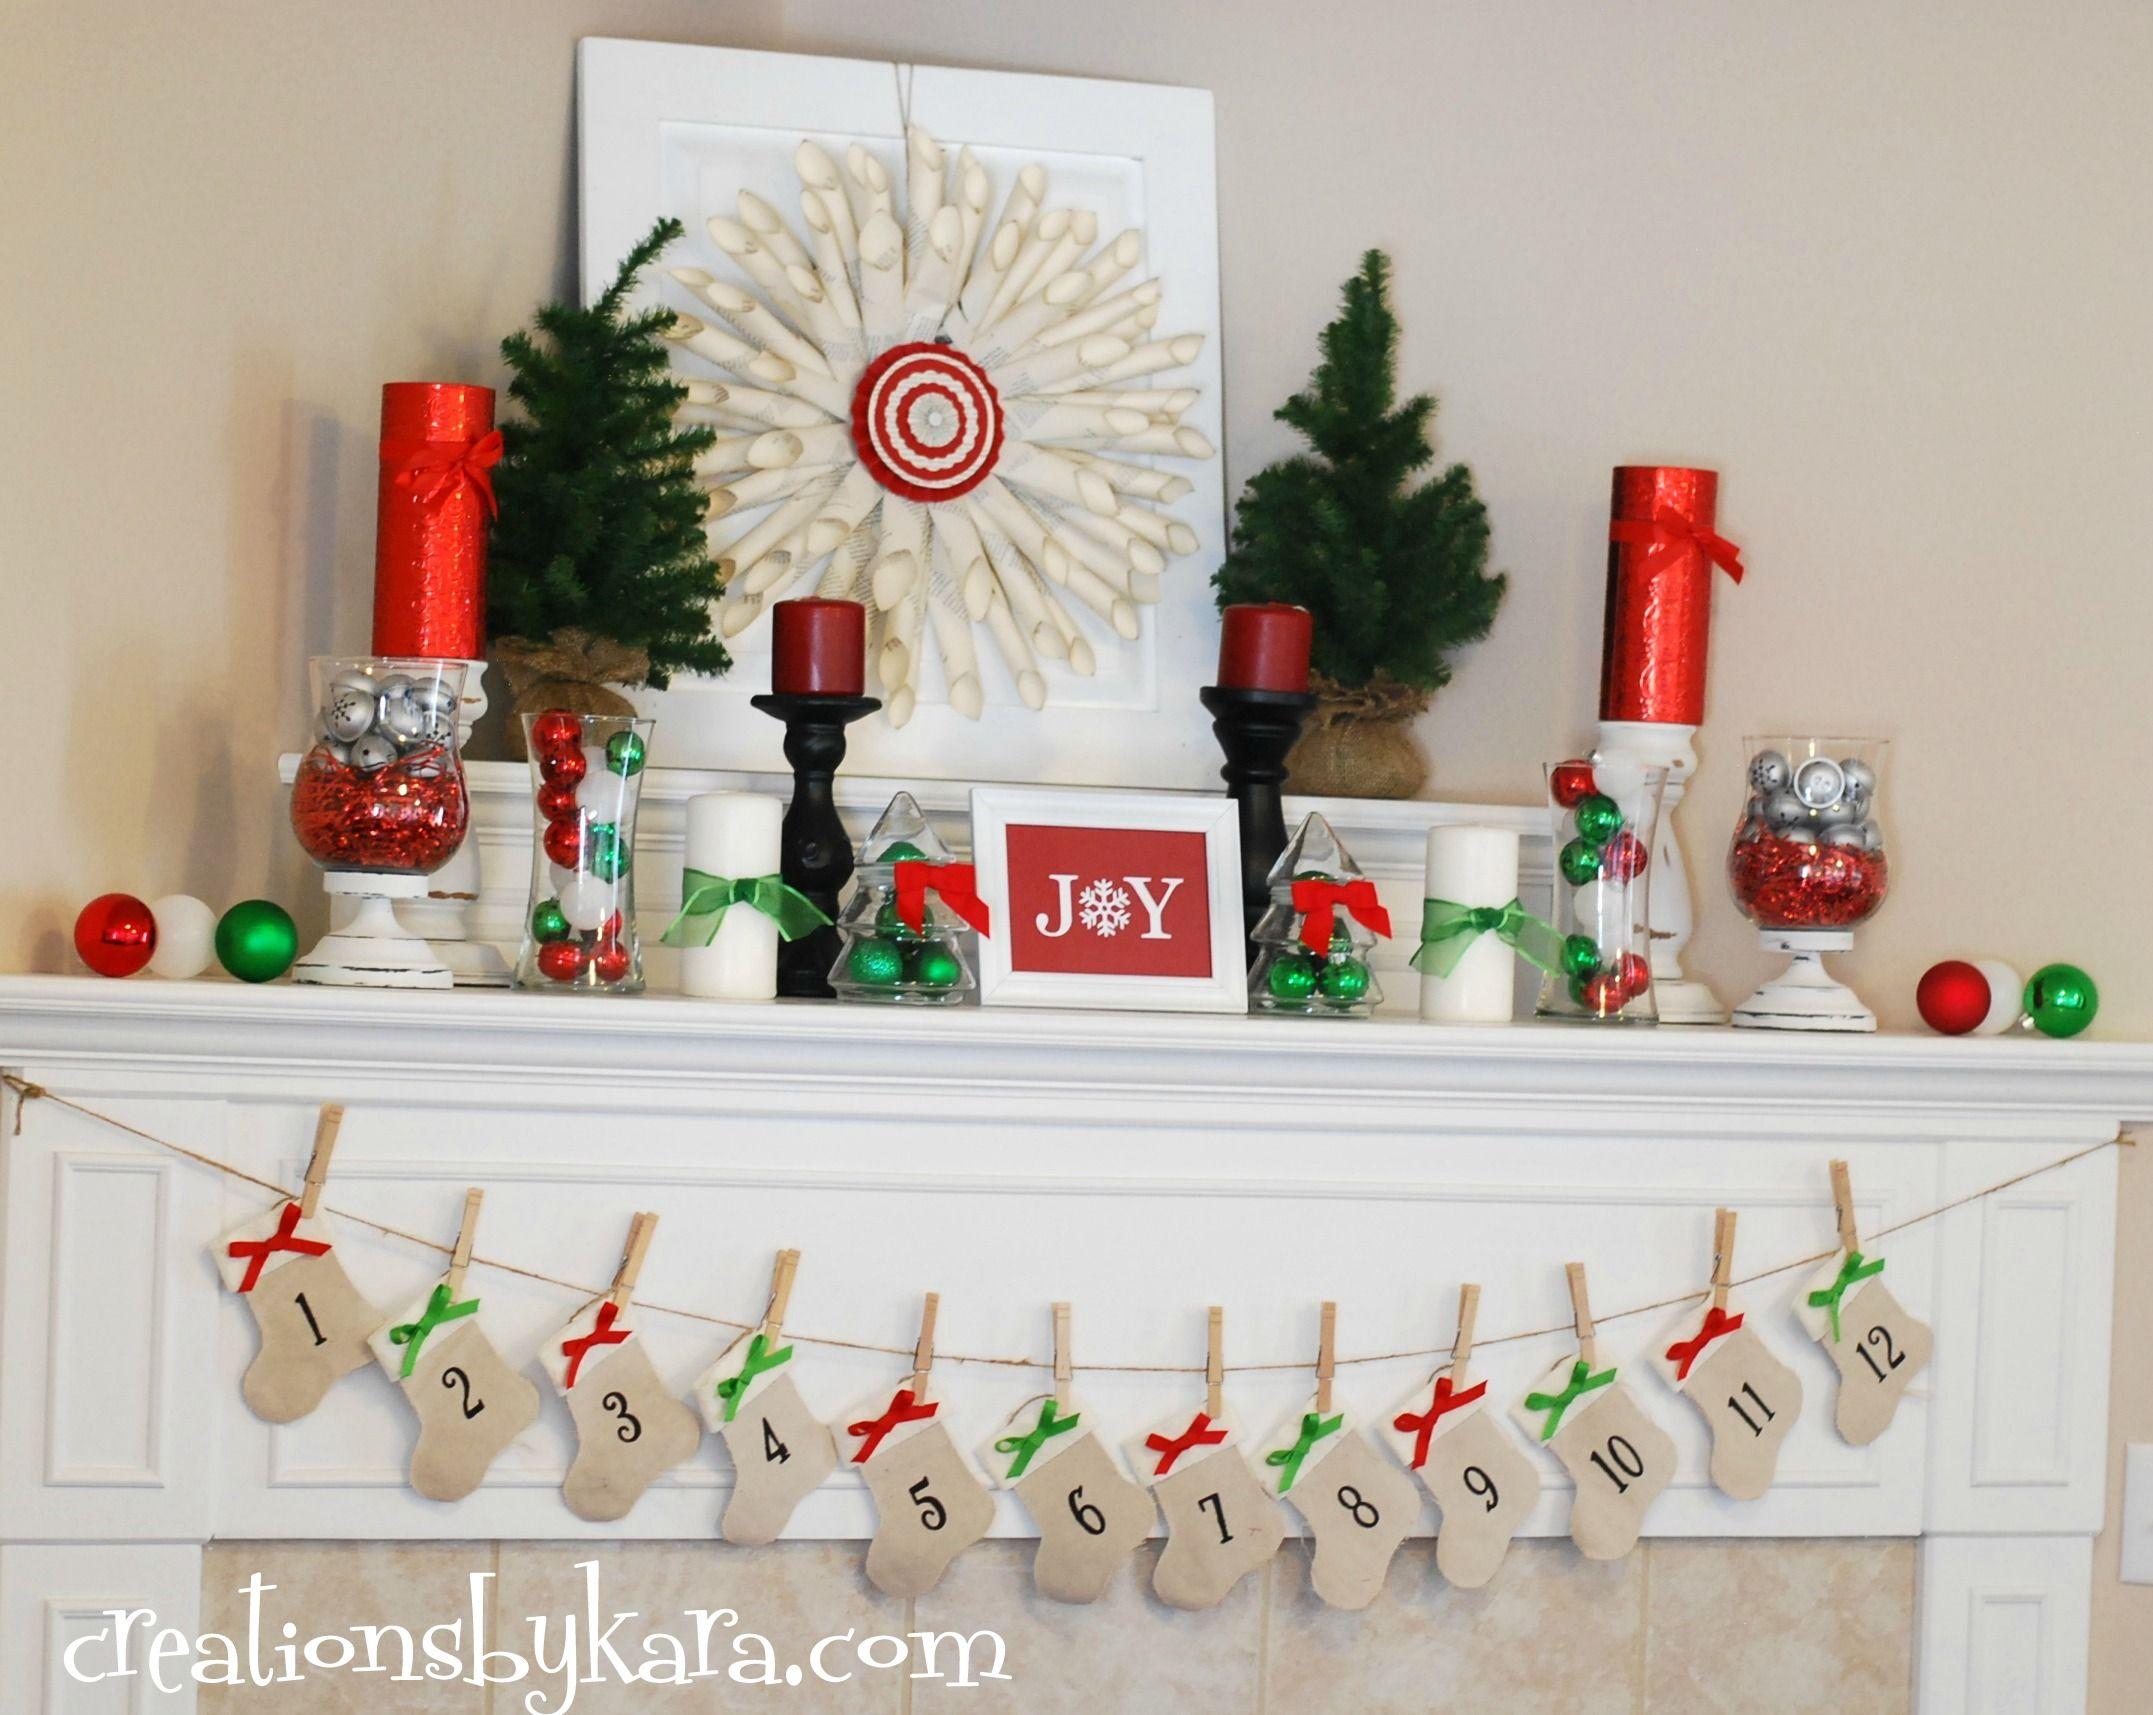 Top 40 Christmas Mantelpiece Decorations Ideas   Christmas mantels ...